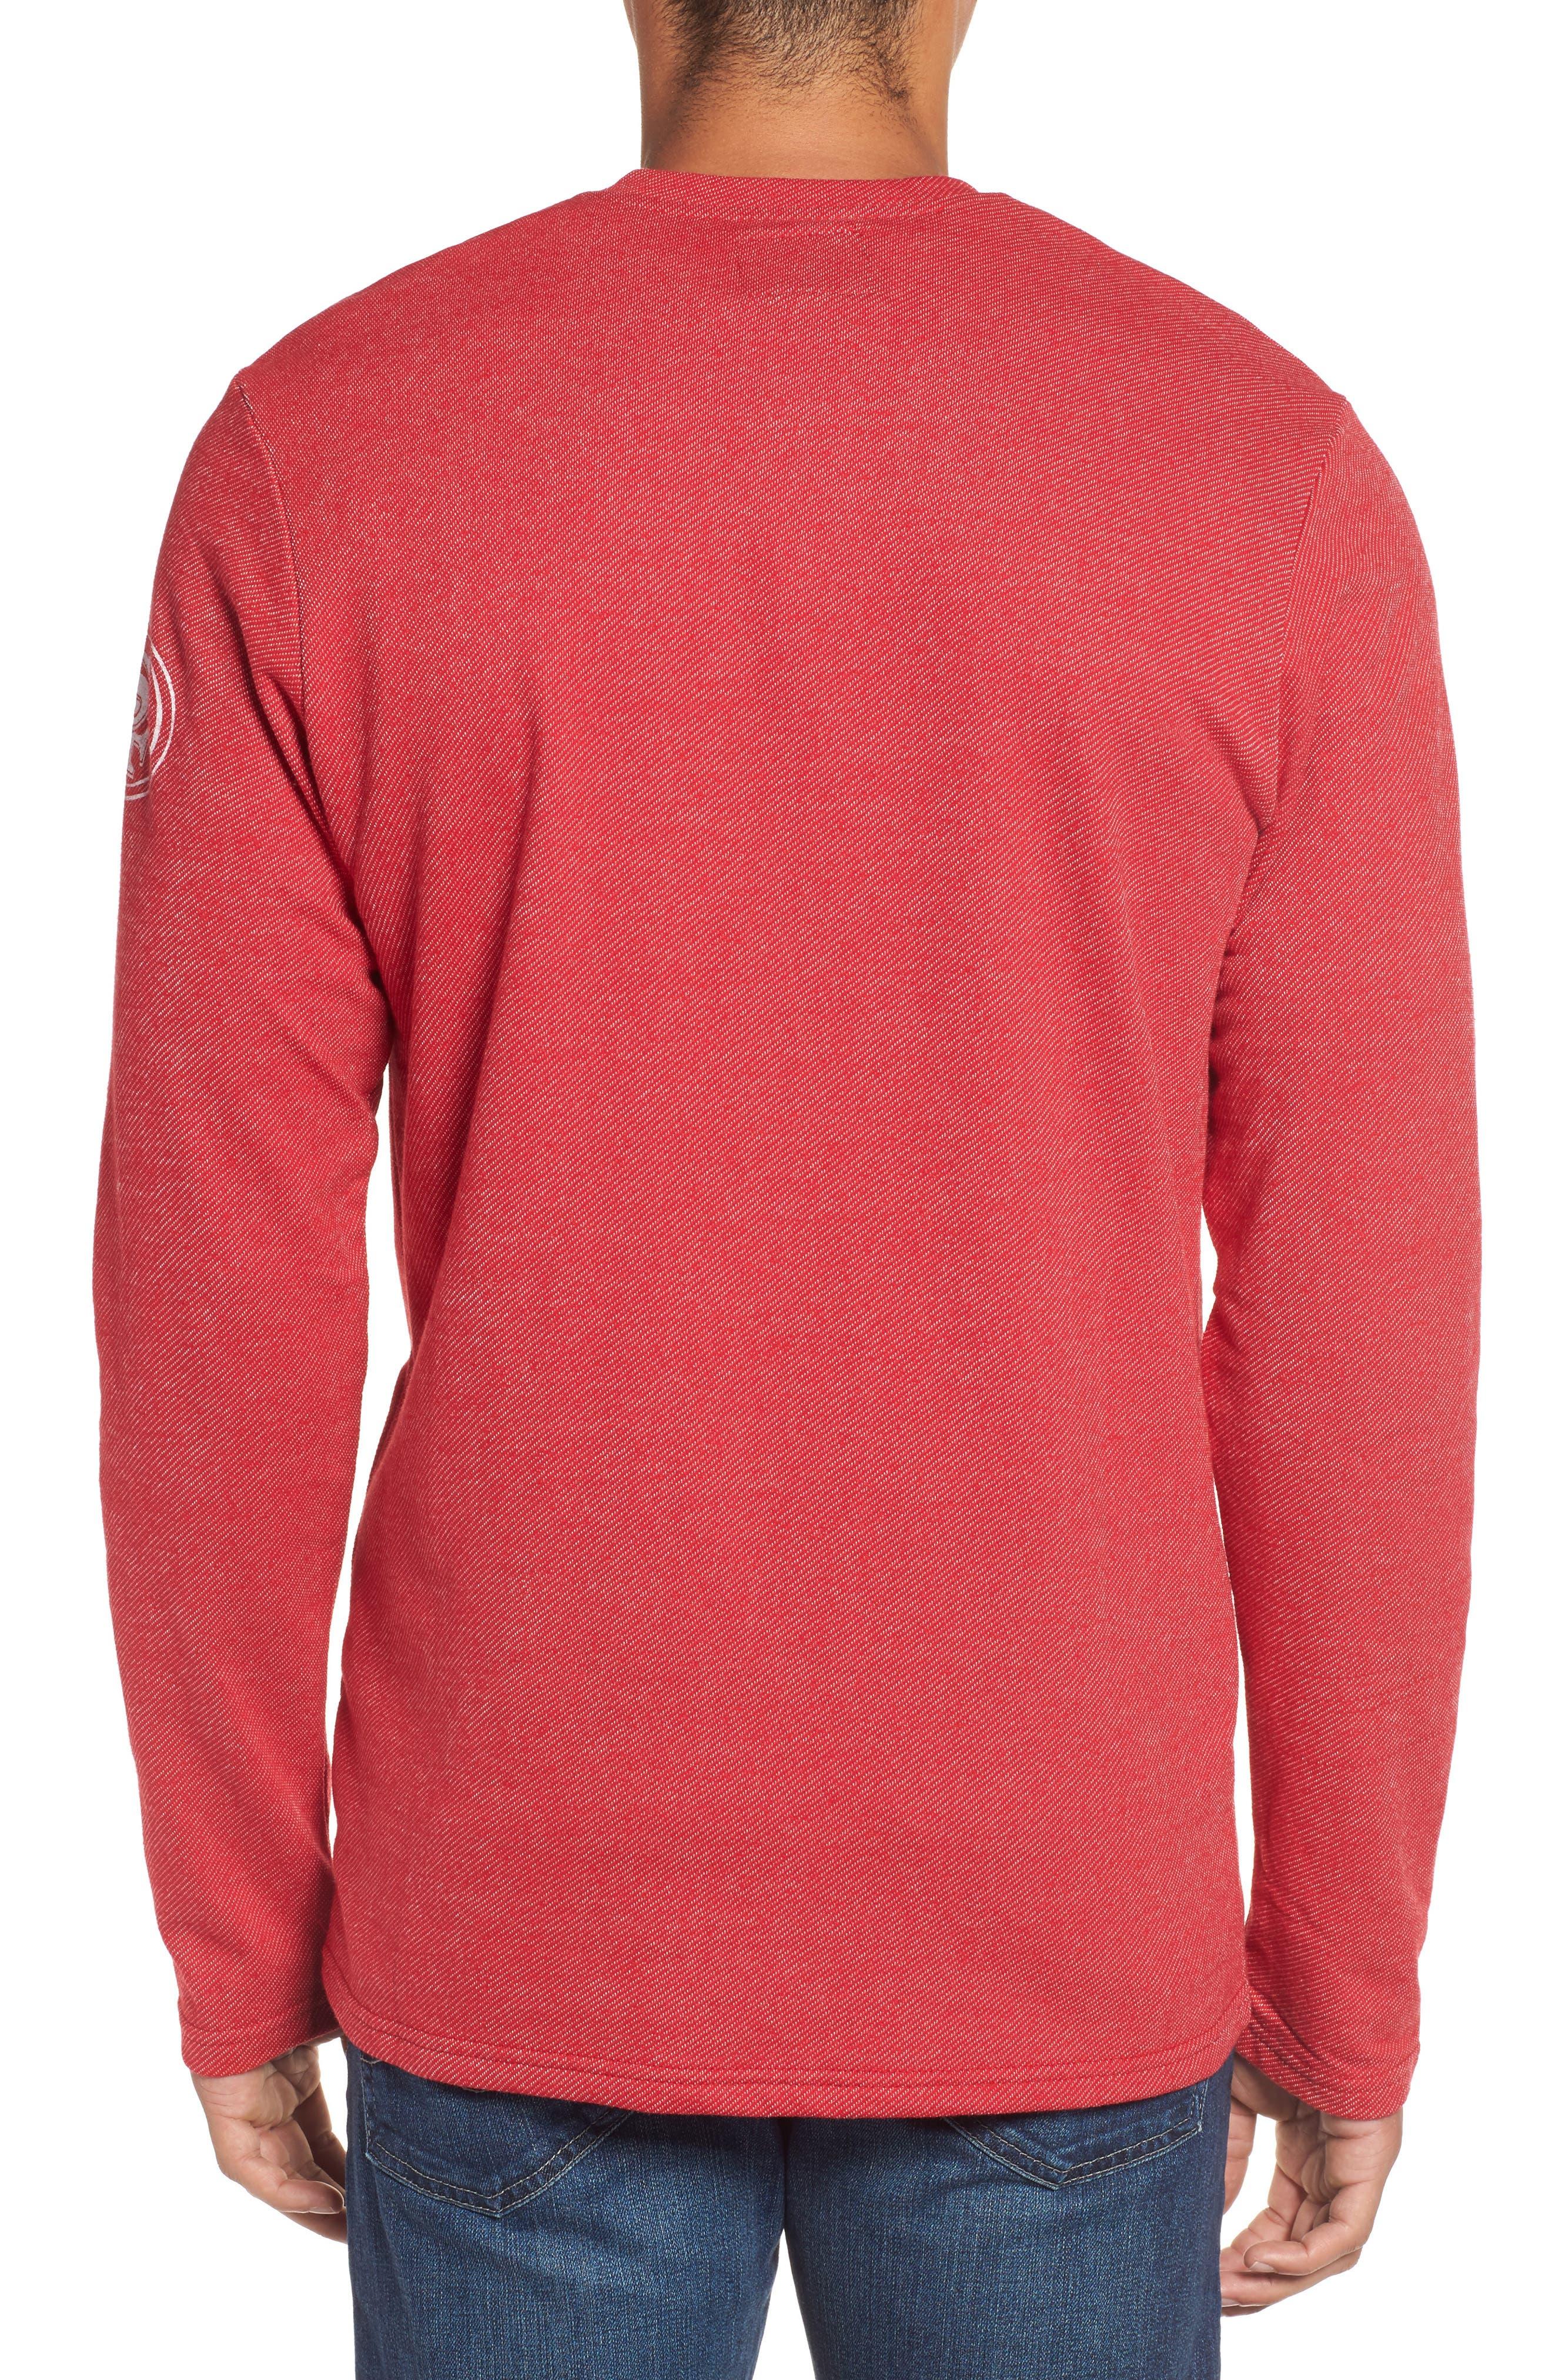 San Francesco 49ers Henley,                             Alternate thumbnail 2, color,                             600